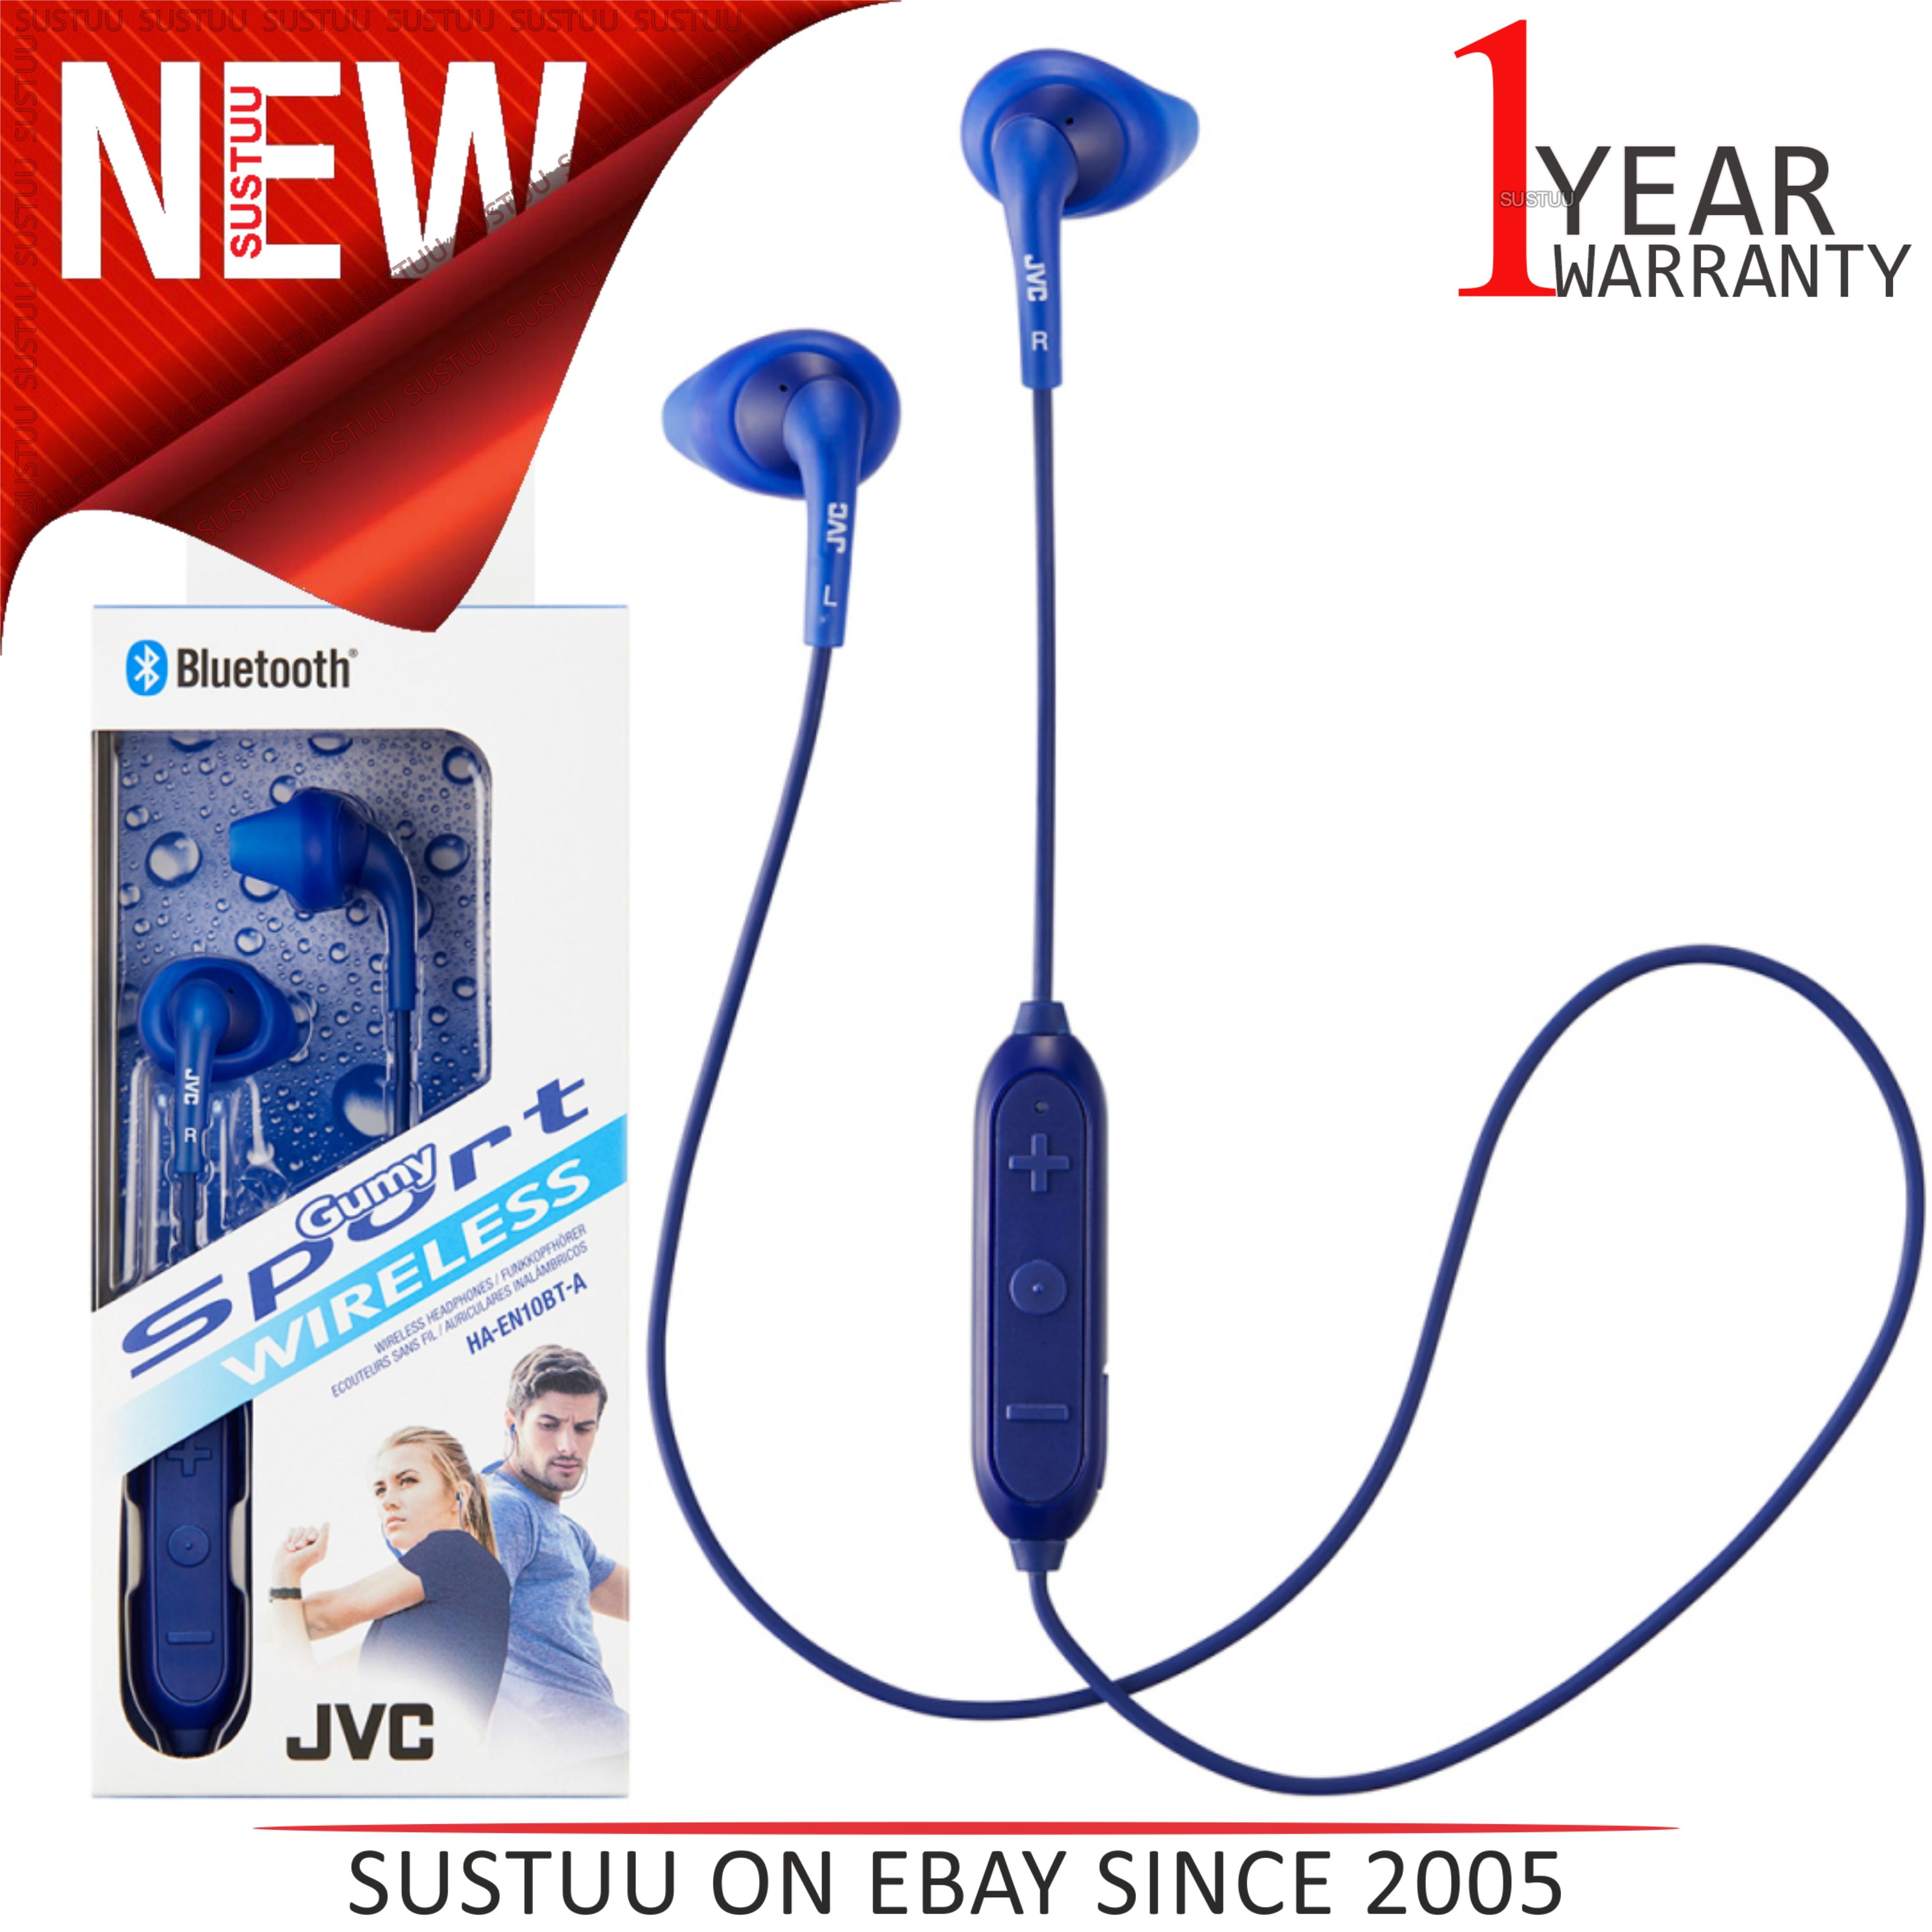 Sentinel JVC HAEN10BTAE Gumy Sports Wireless Bluetooth Headphone│Swet  Proof│Nozzle Fit f6e097090d51